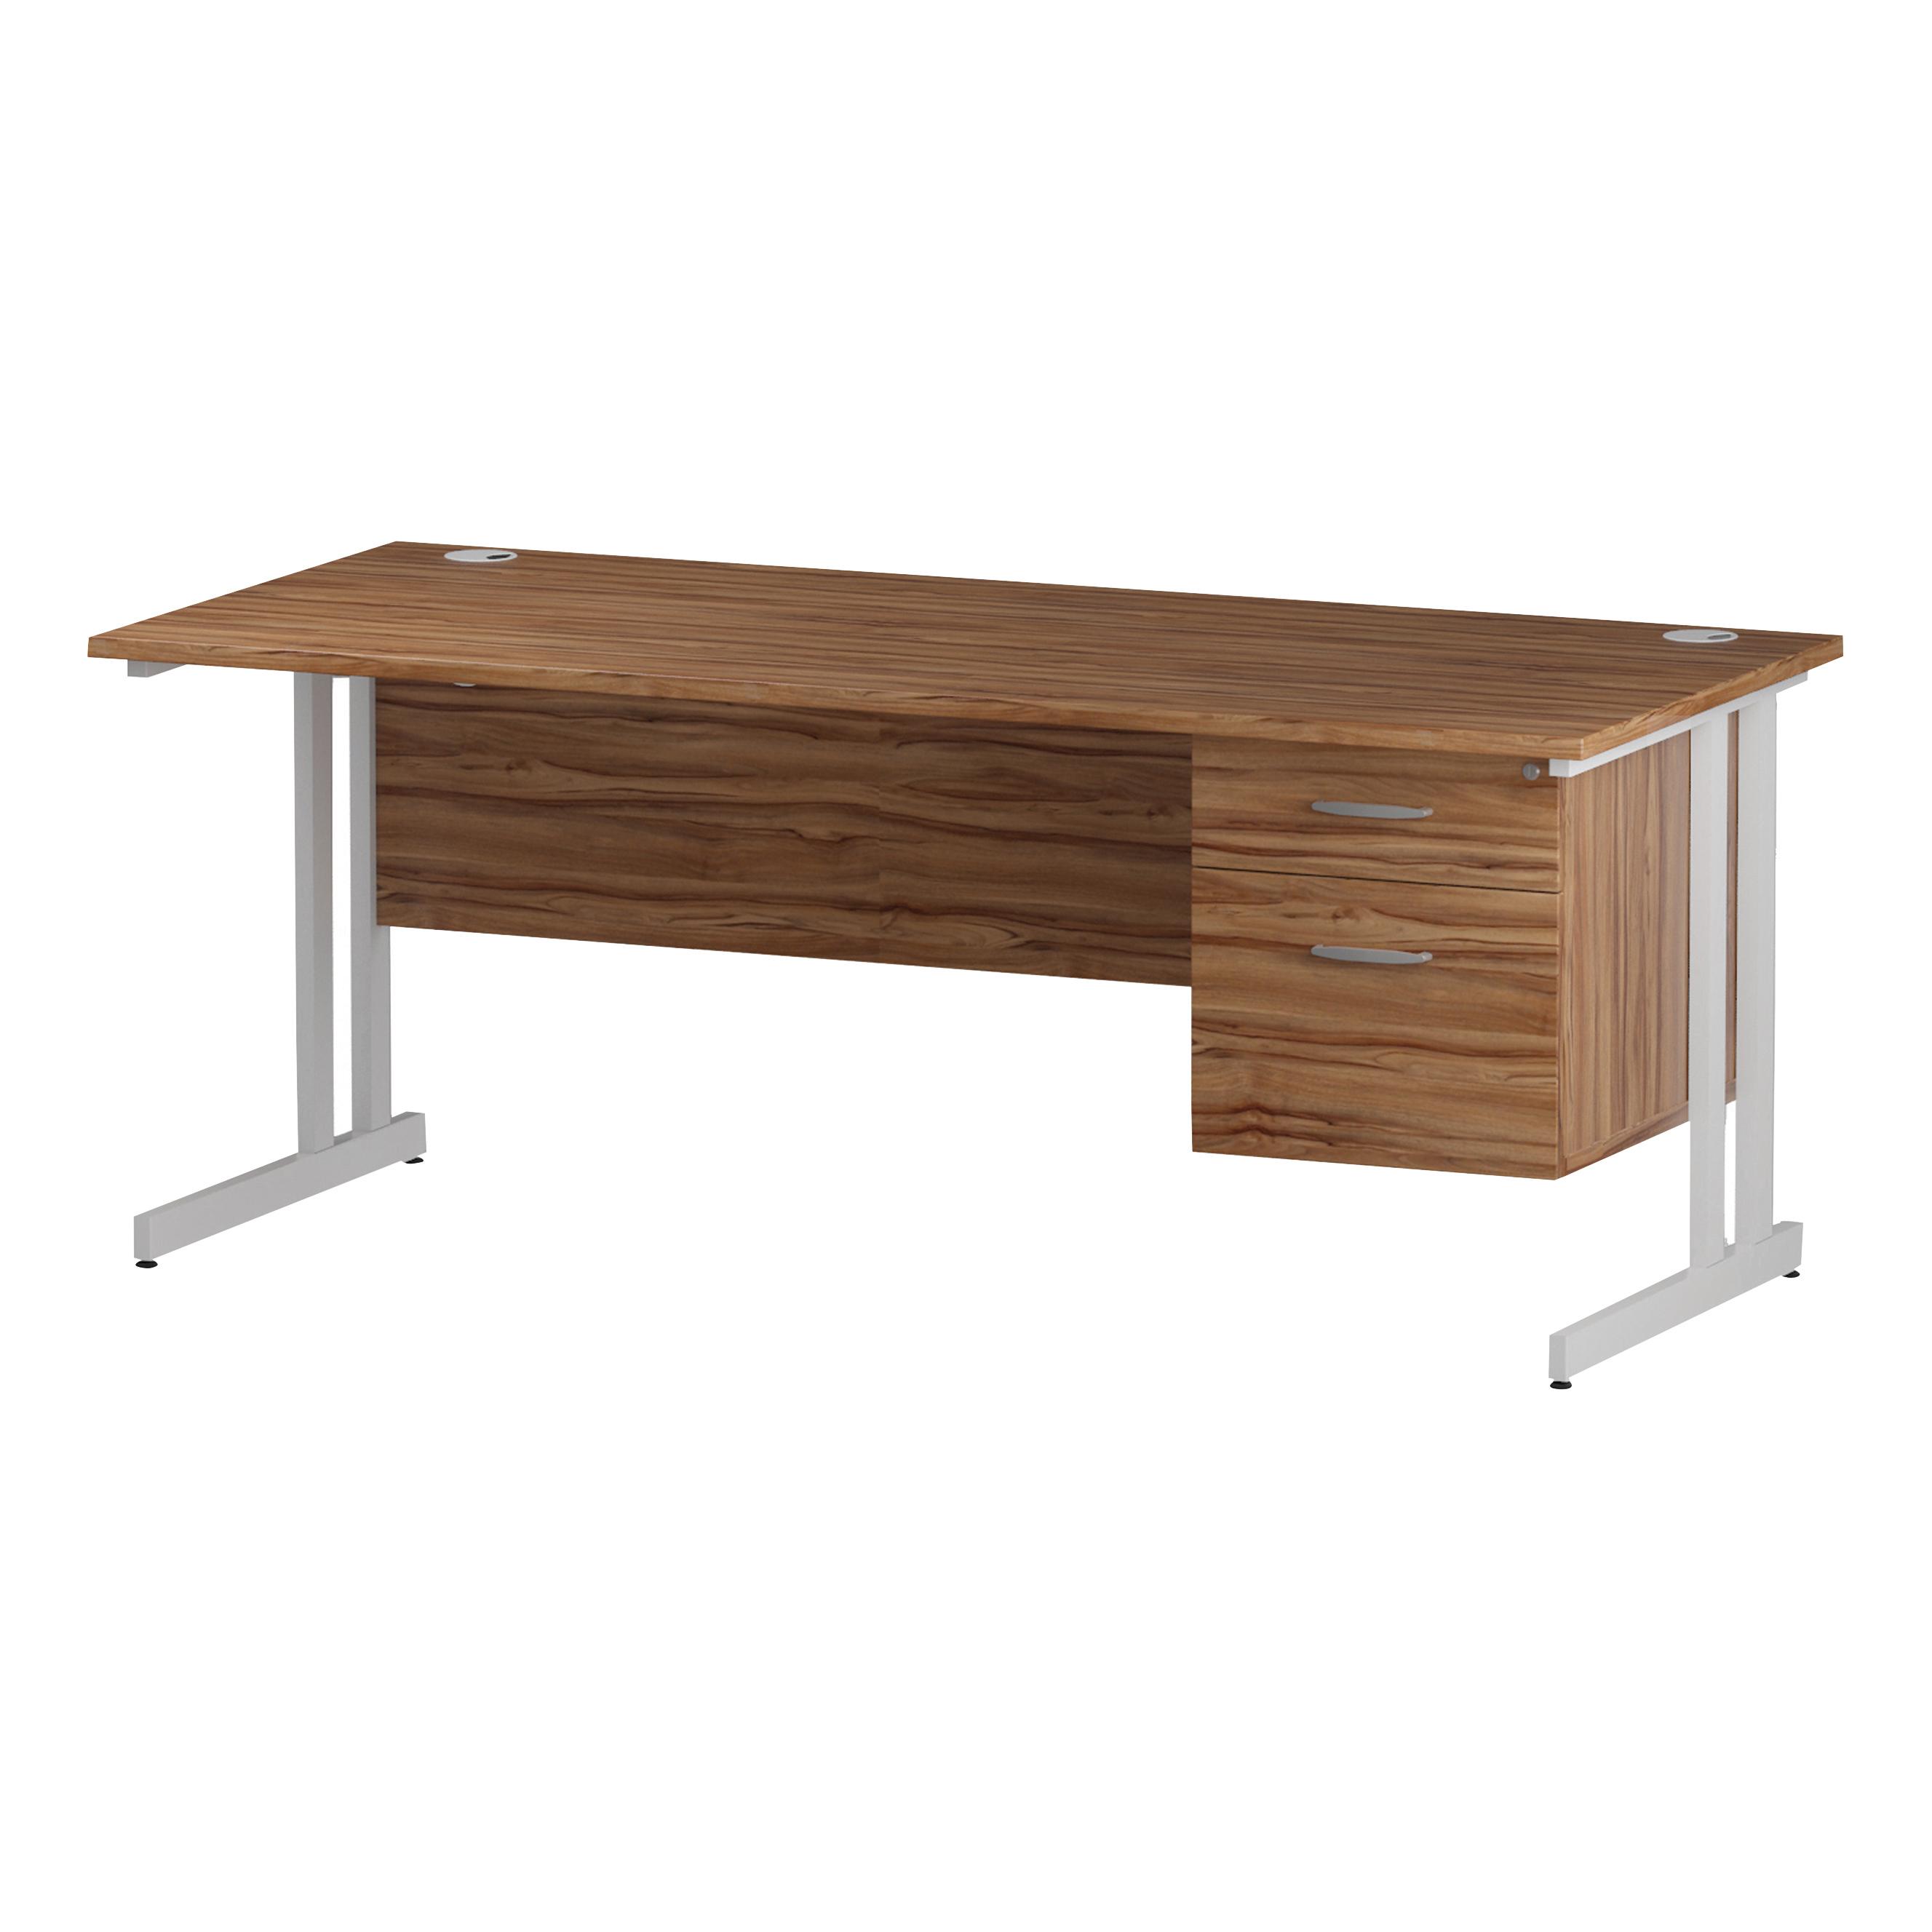 Trexus Rectangular Desk White Cantilever Leg 1800x800mm Fixed Pedestal 2 Drawers Walnut Ref I001926